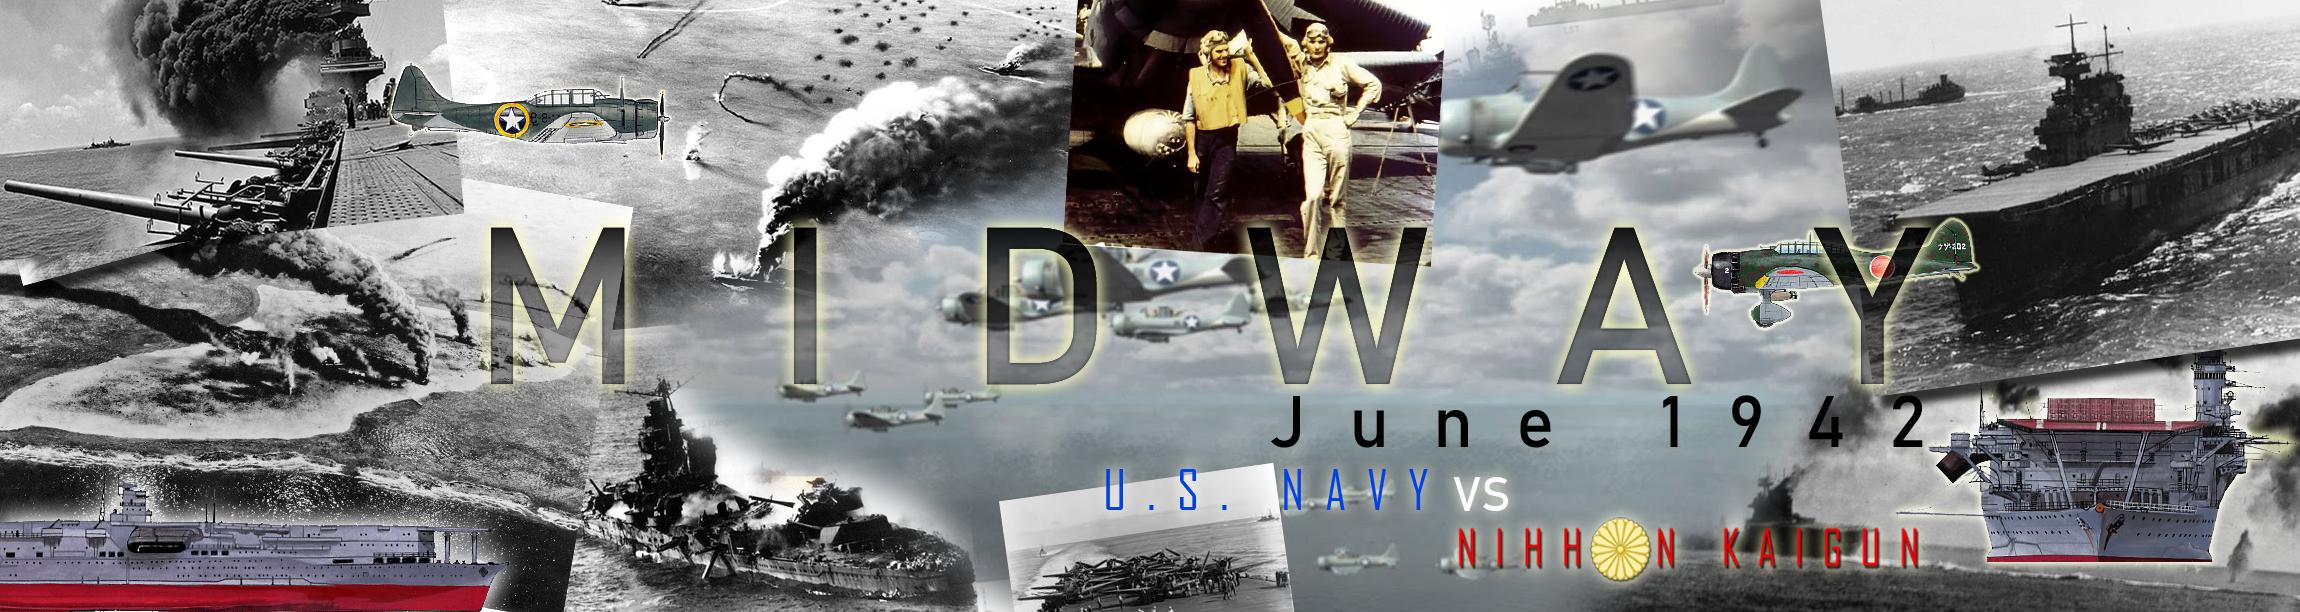 Battle of Midway (4-7 June 1942)